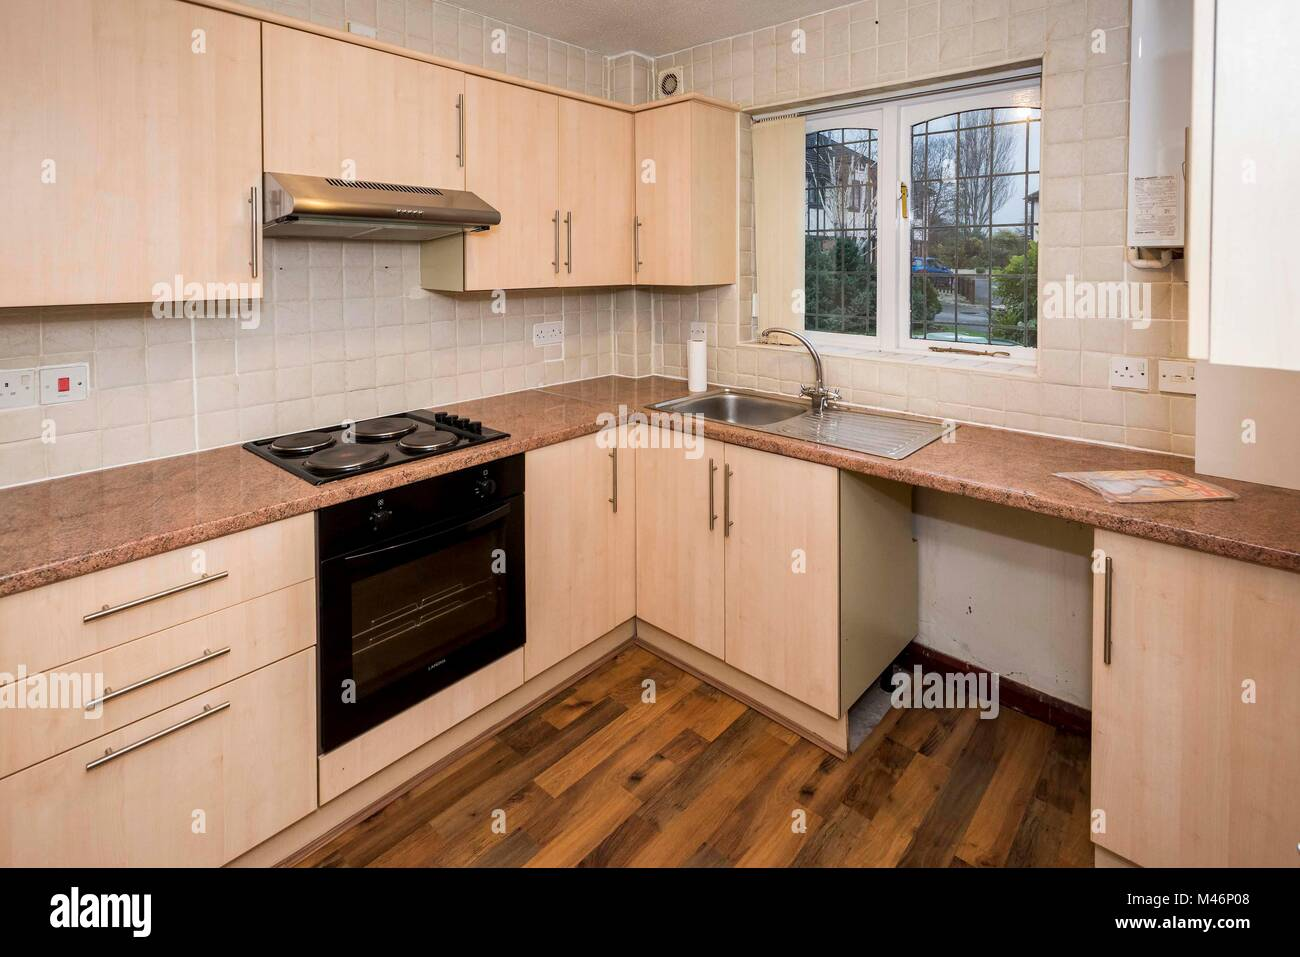 A modern average kitchen - Stock Image